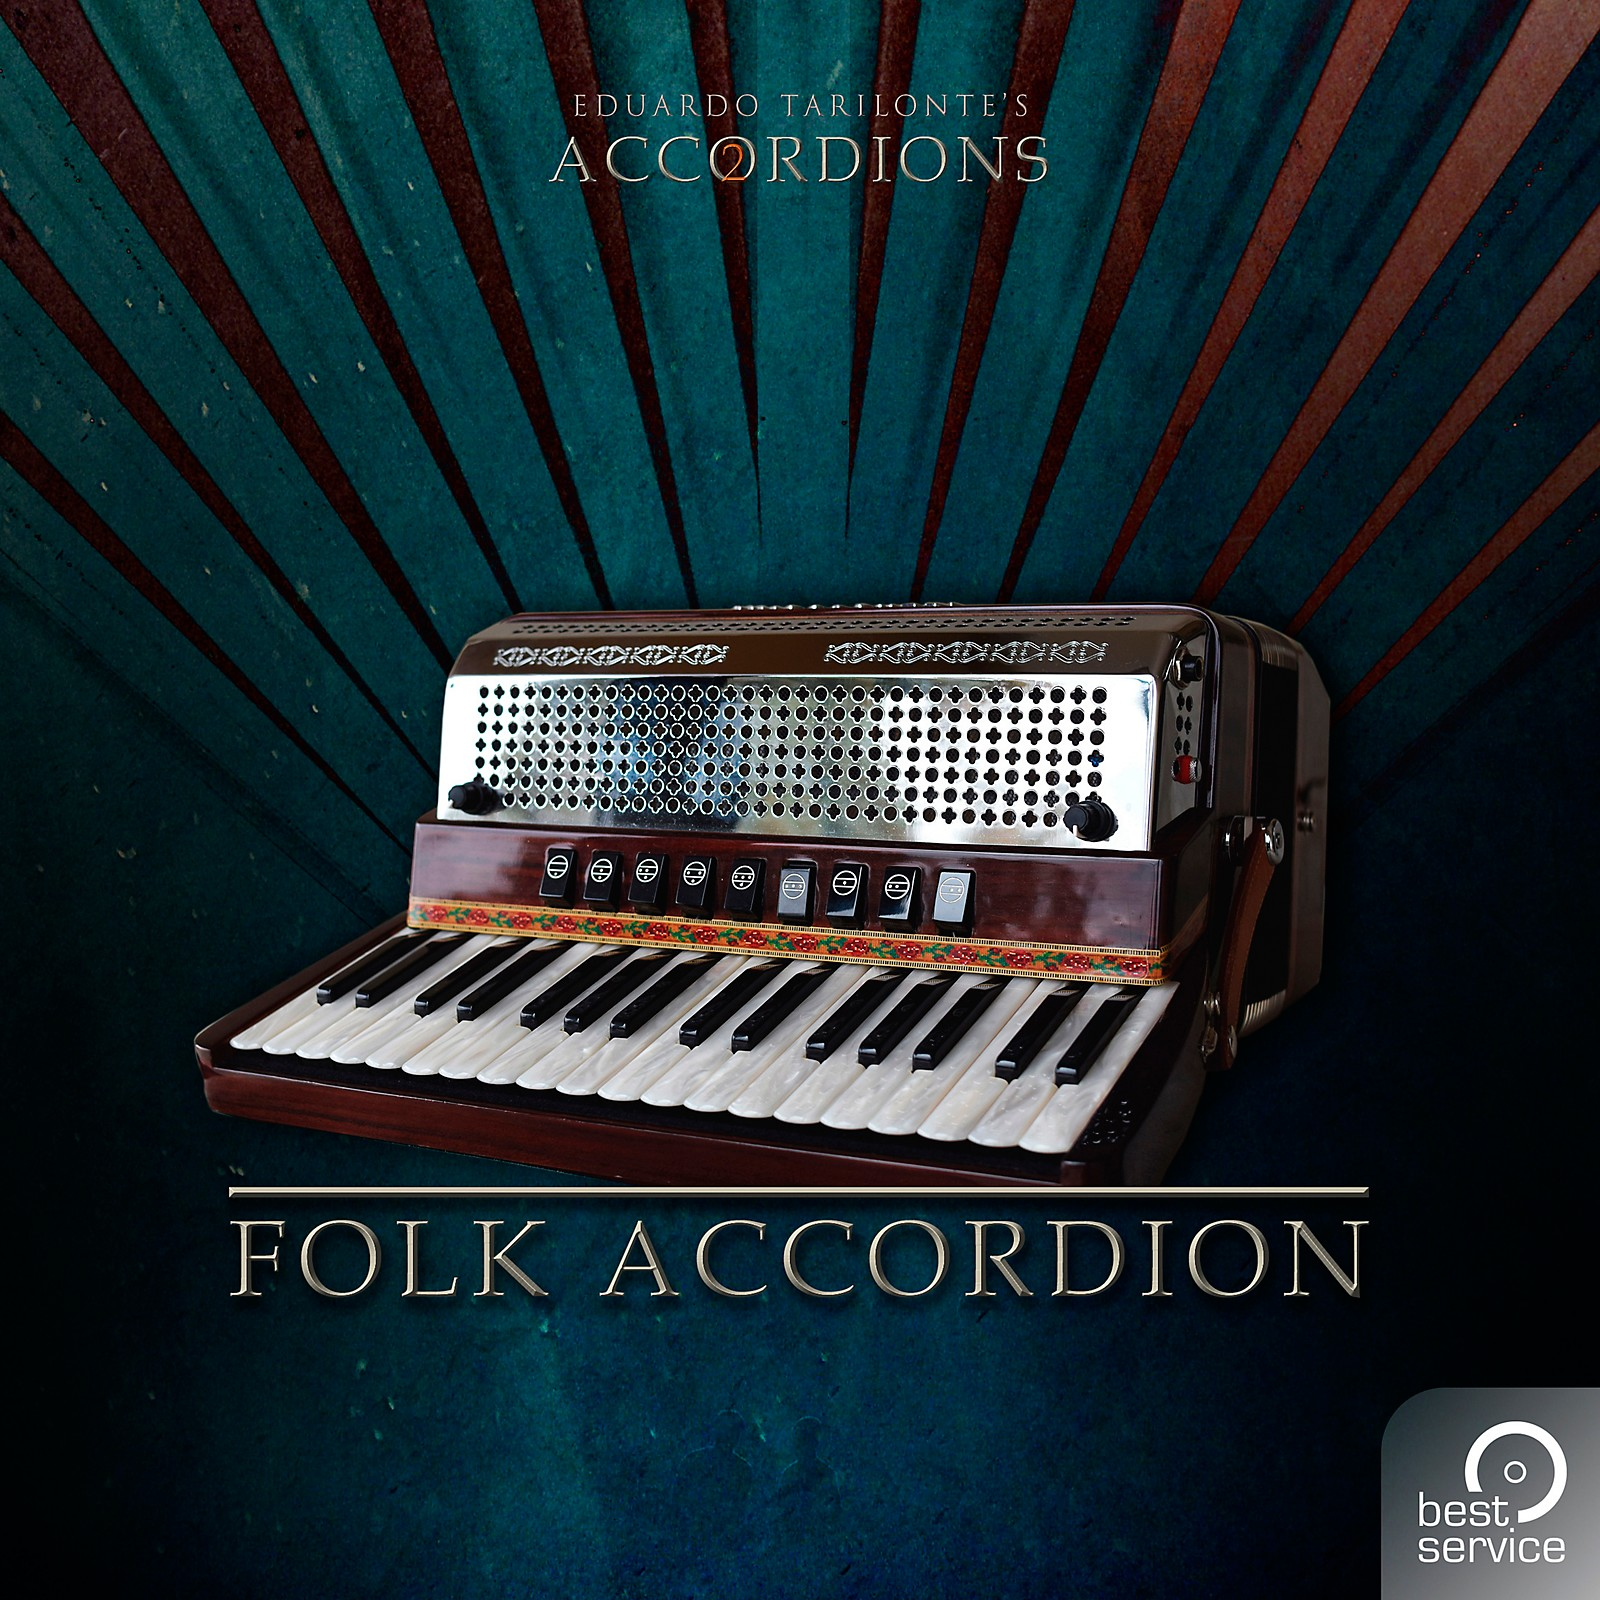 Best Service Accordions 2 - Single Folk Accordion